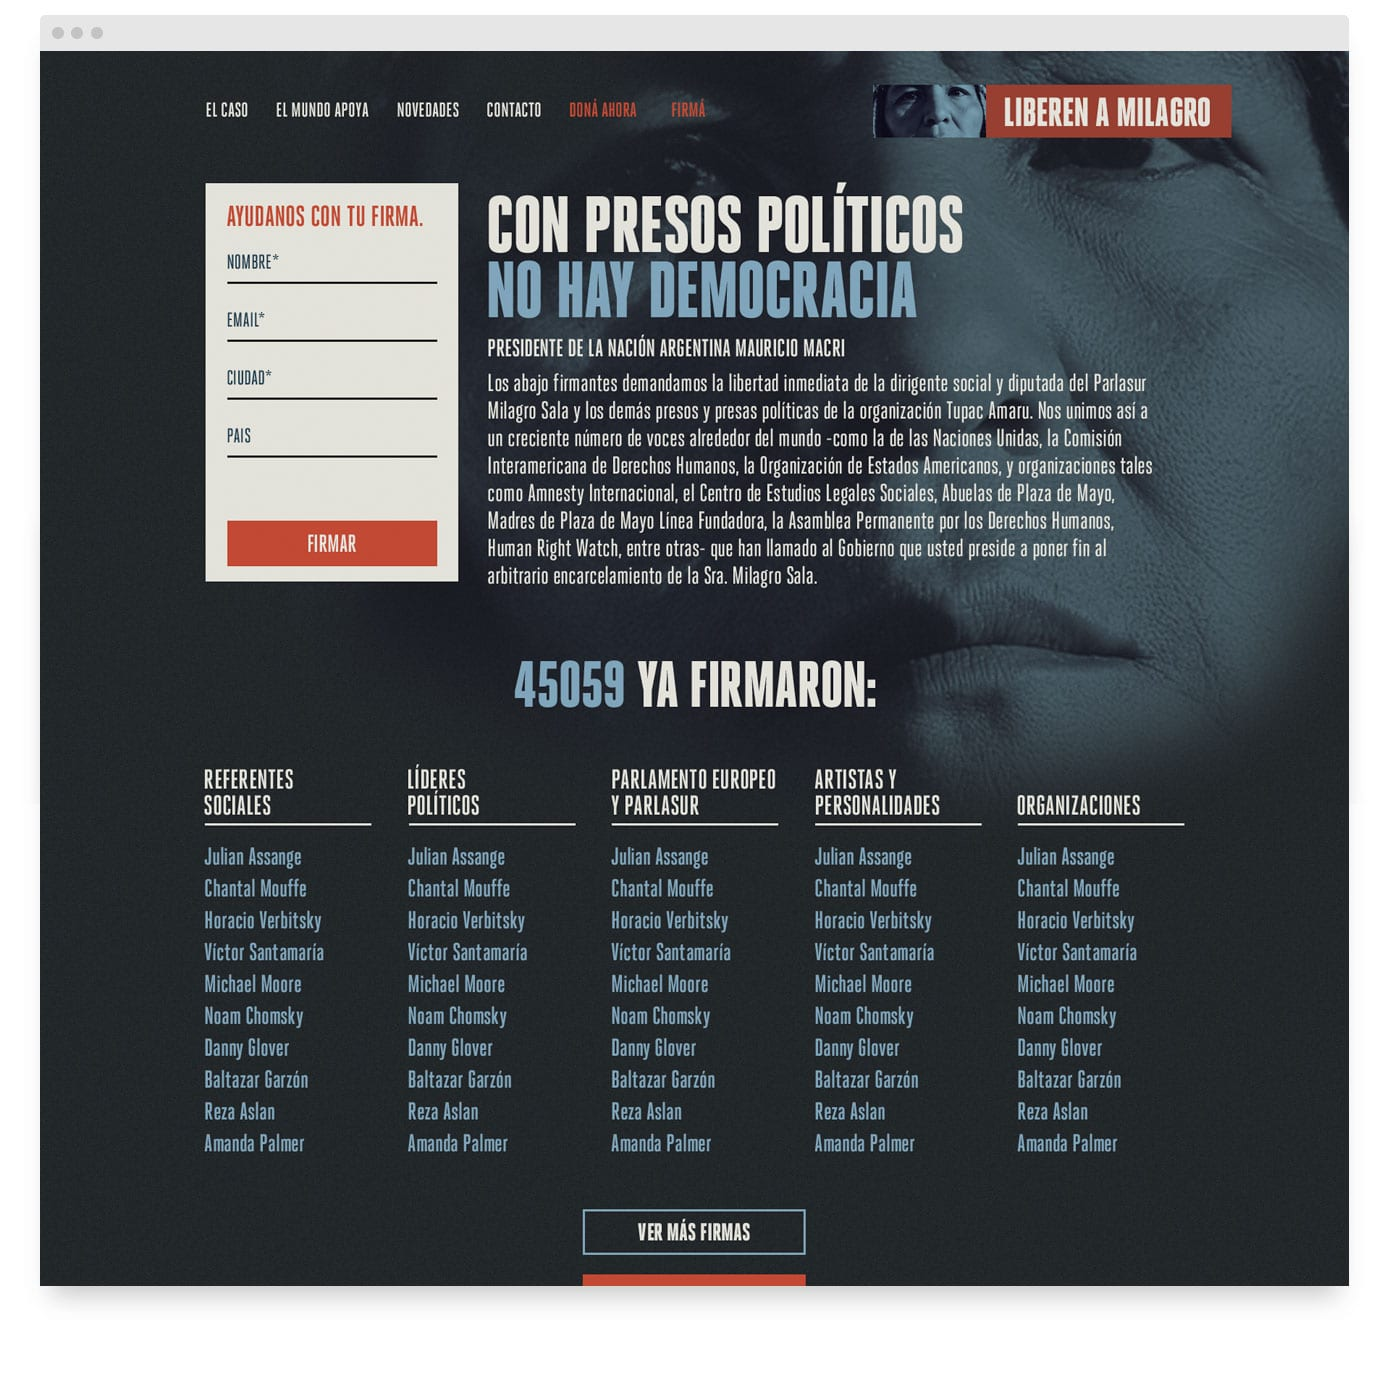 milagro-web-desktop-min.jpg